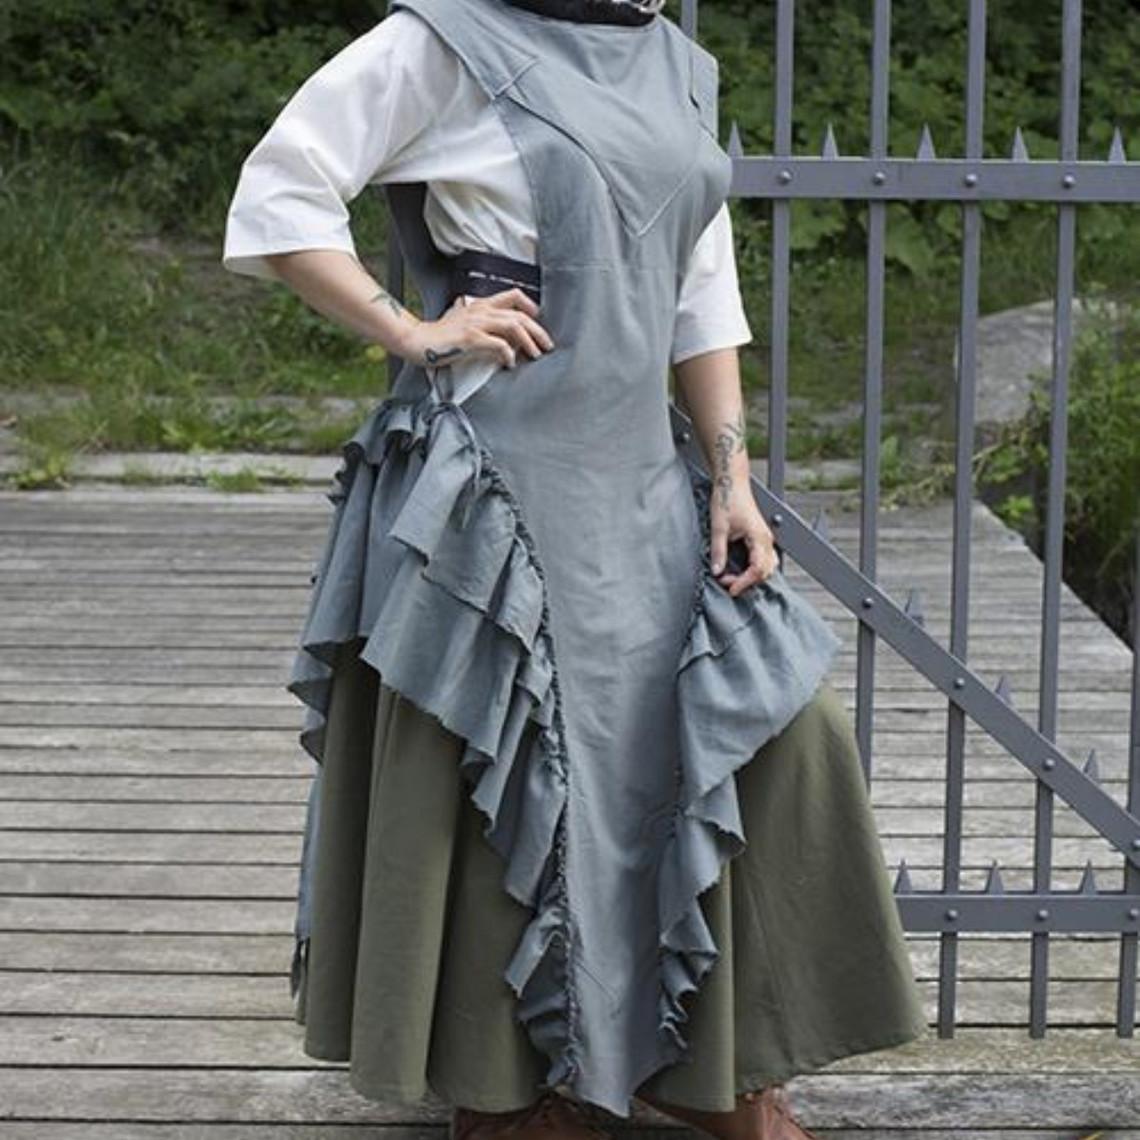 Epic Armoury Abito Raven, grigio